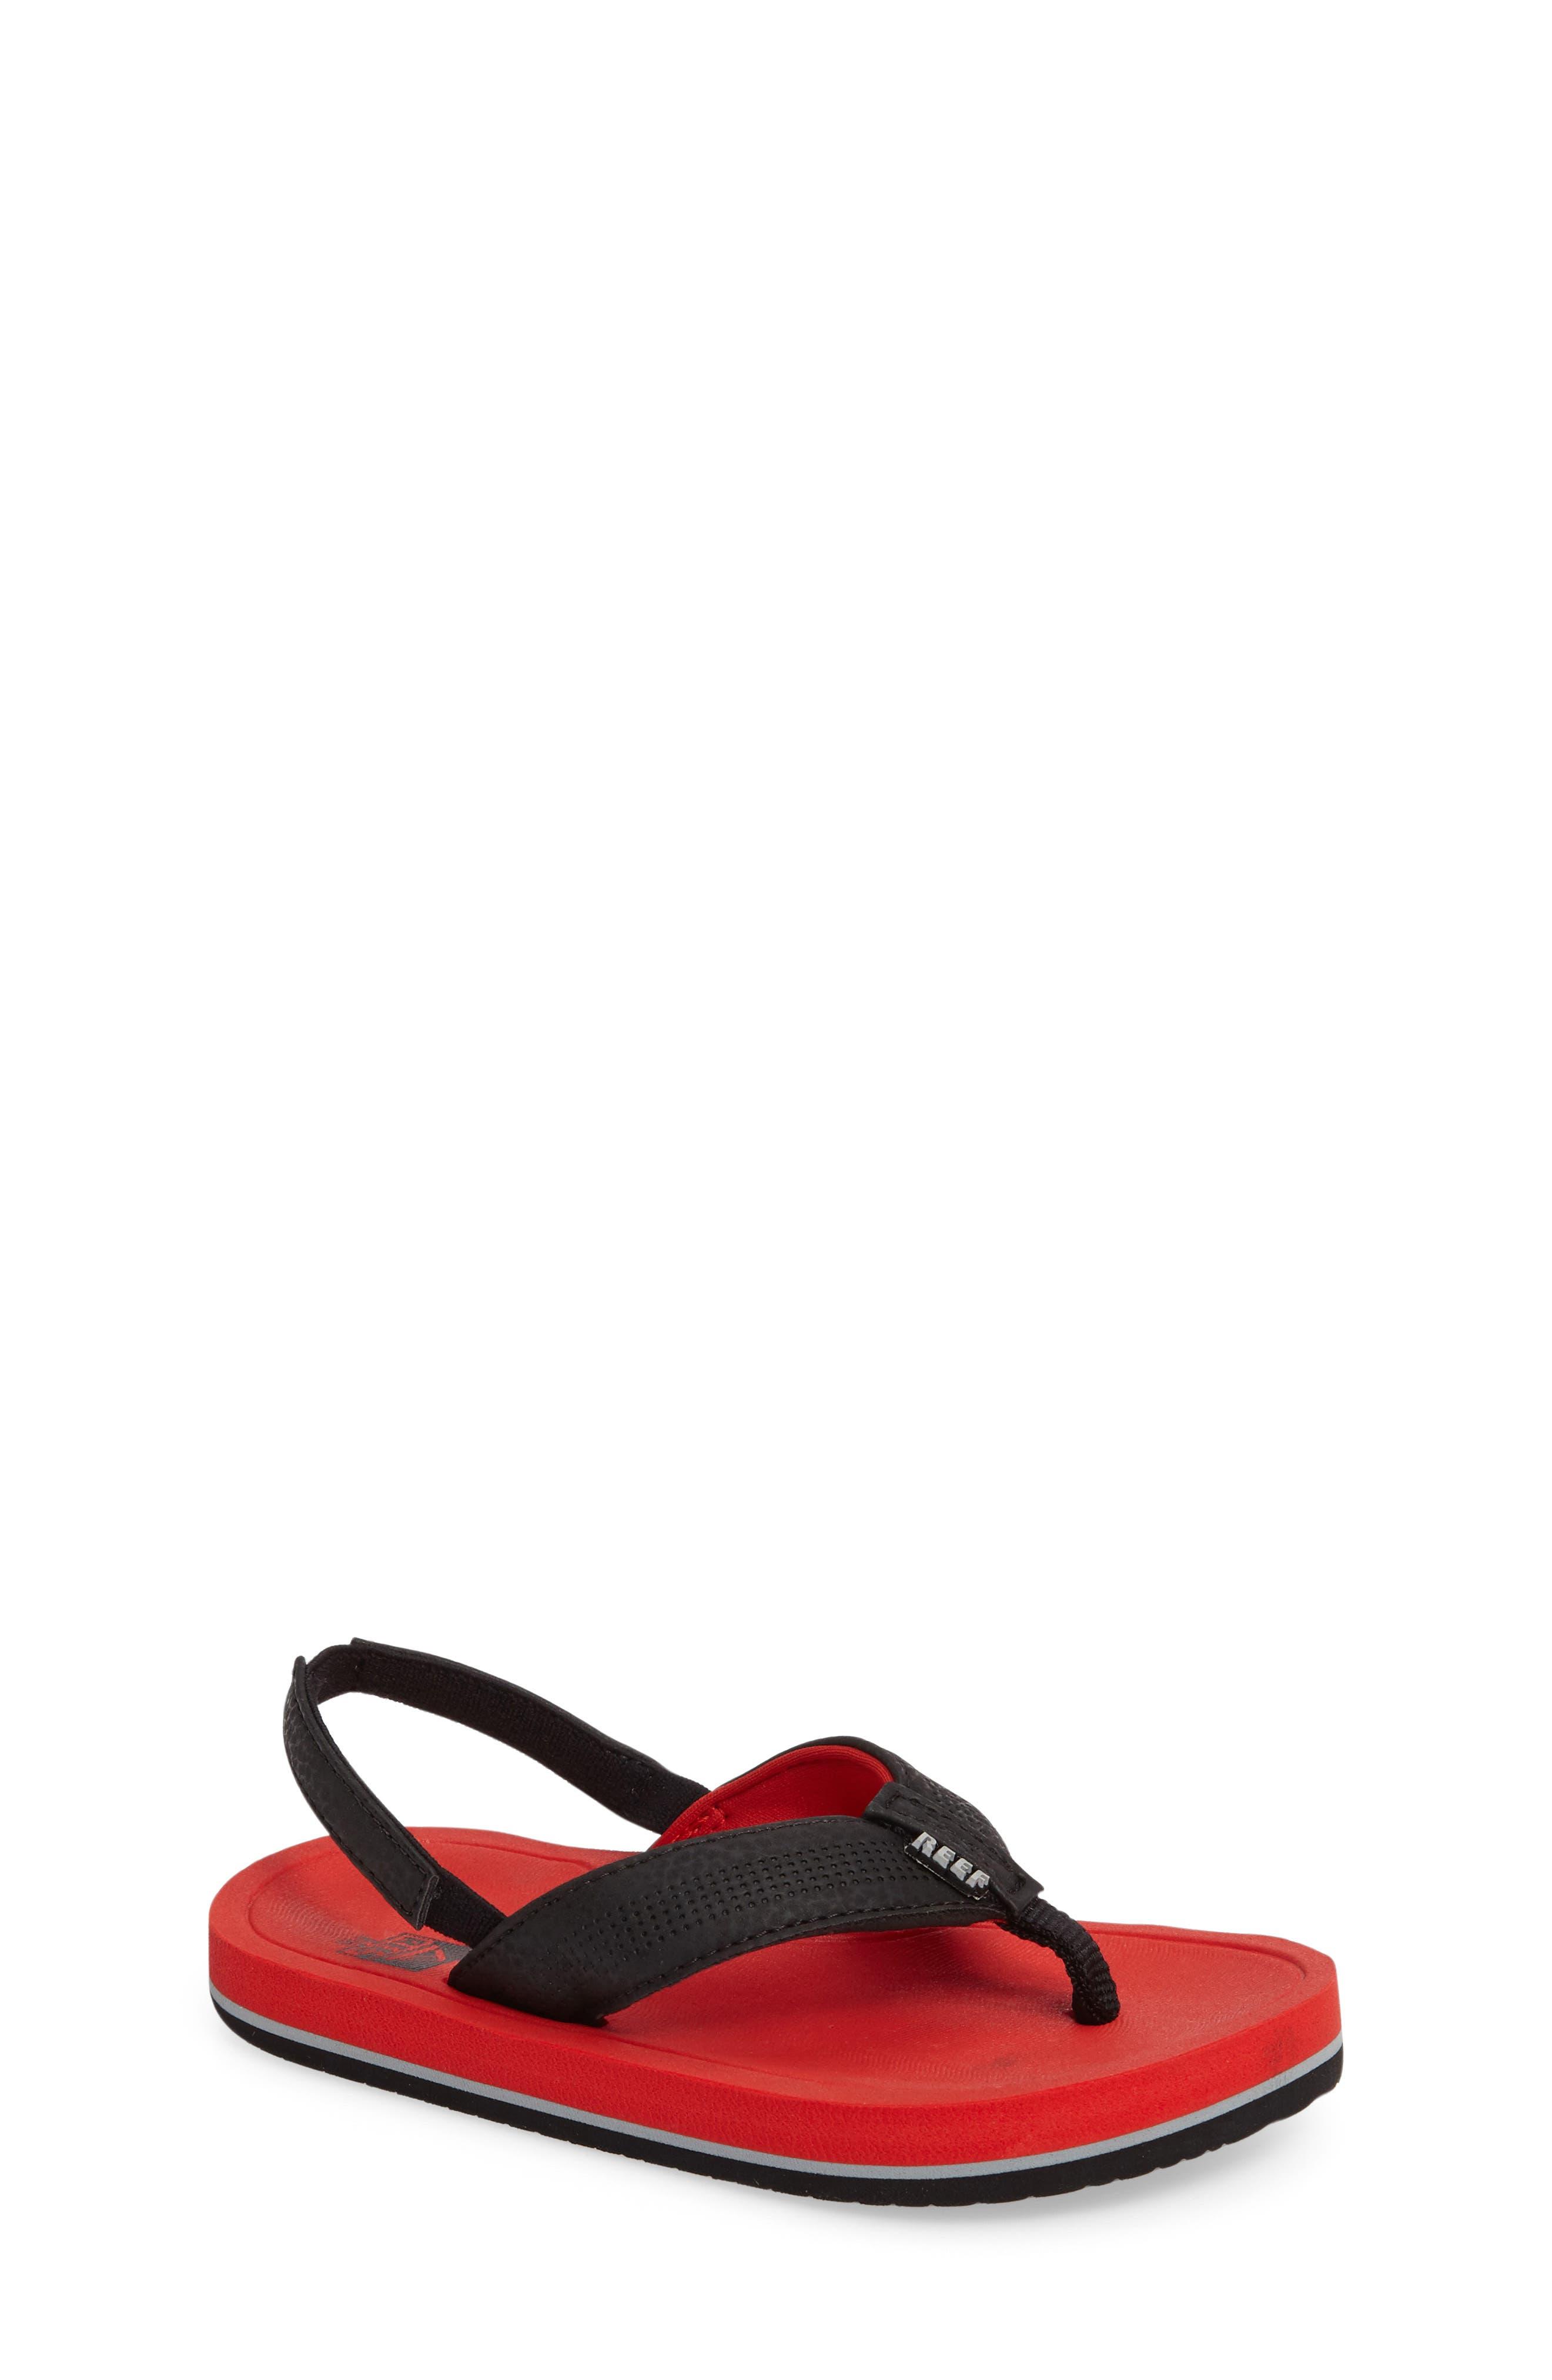 REEF Grom Splash Sandal